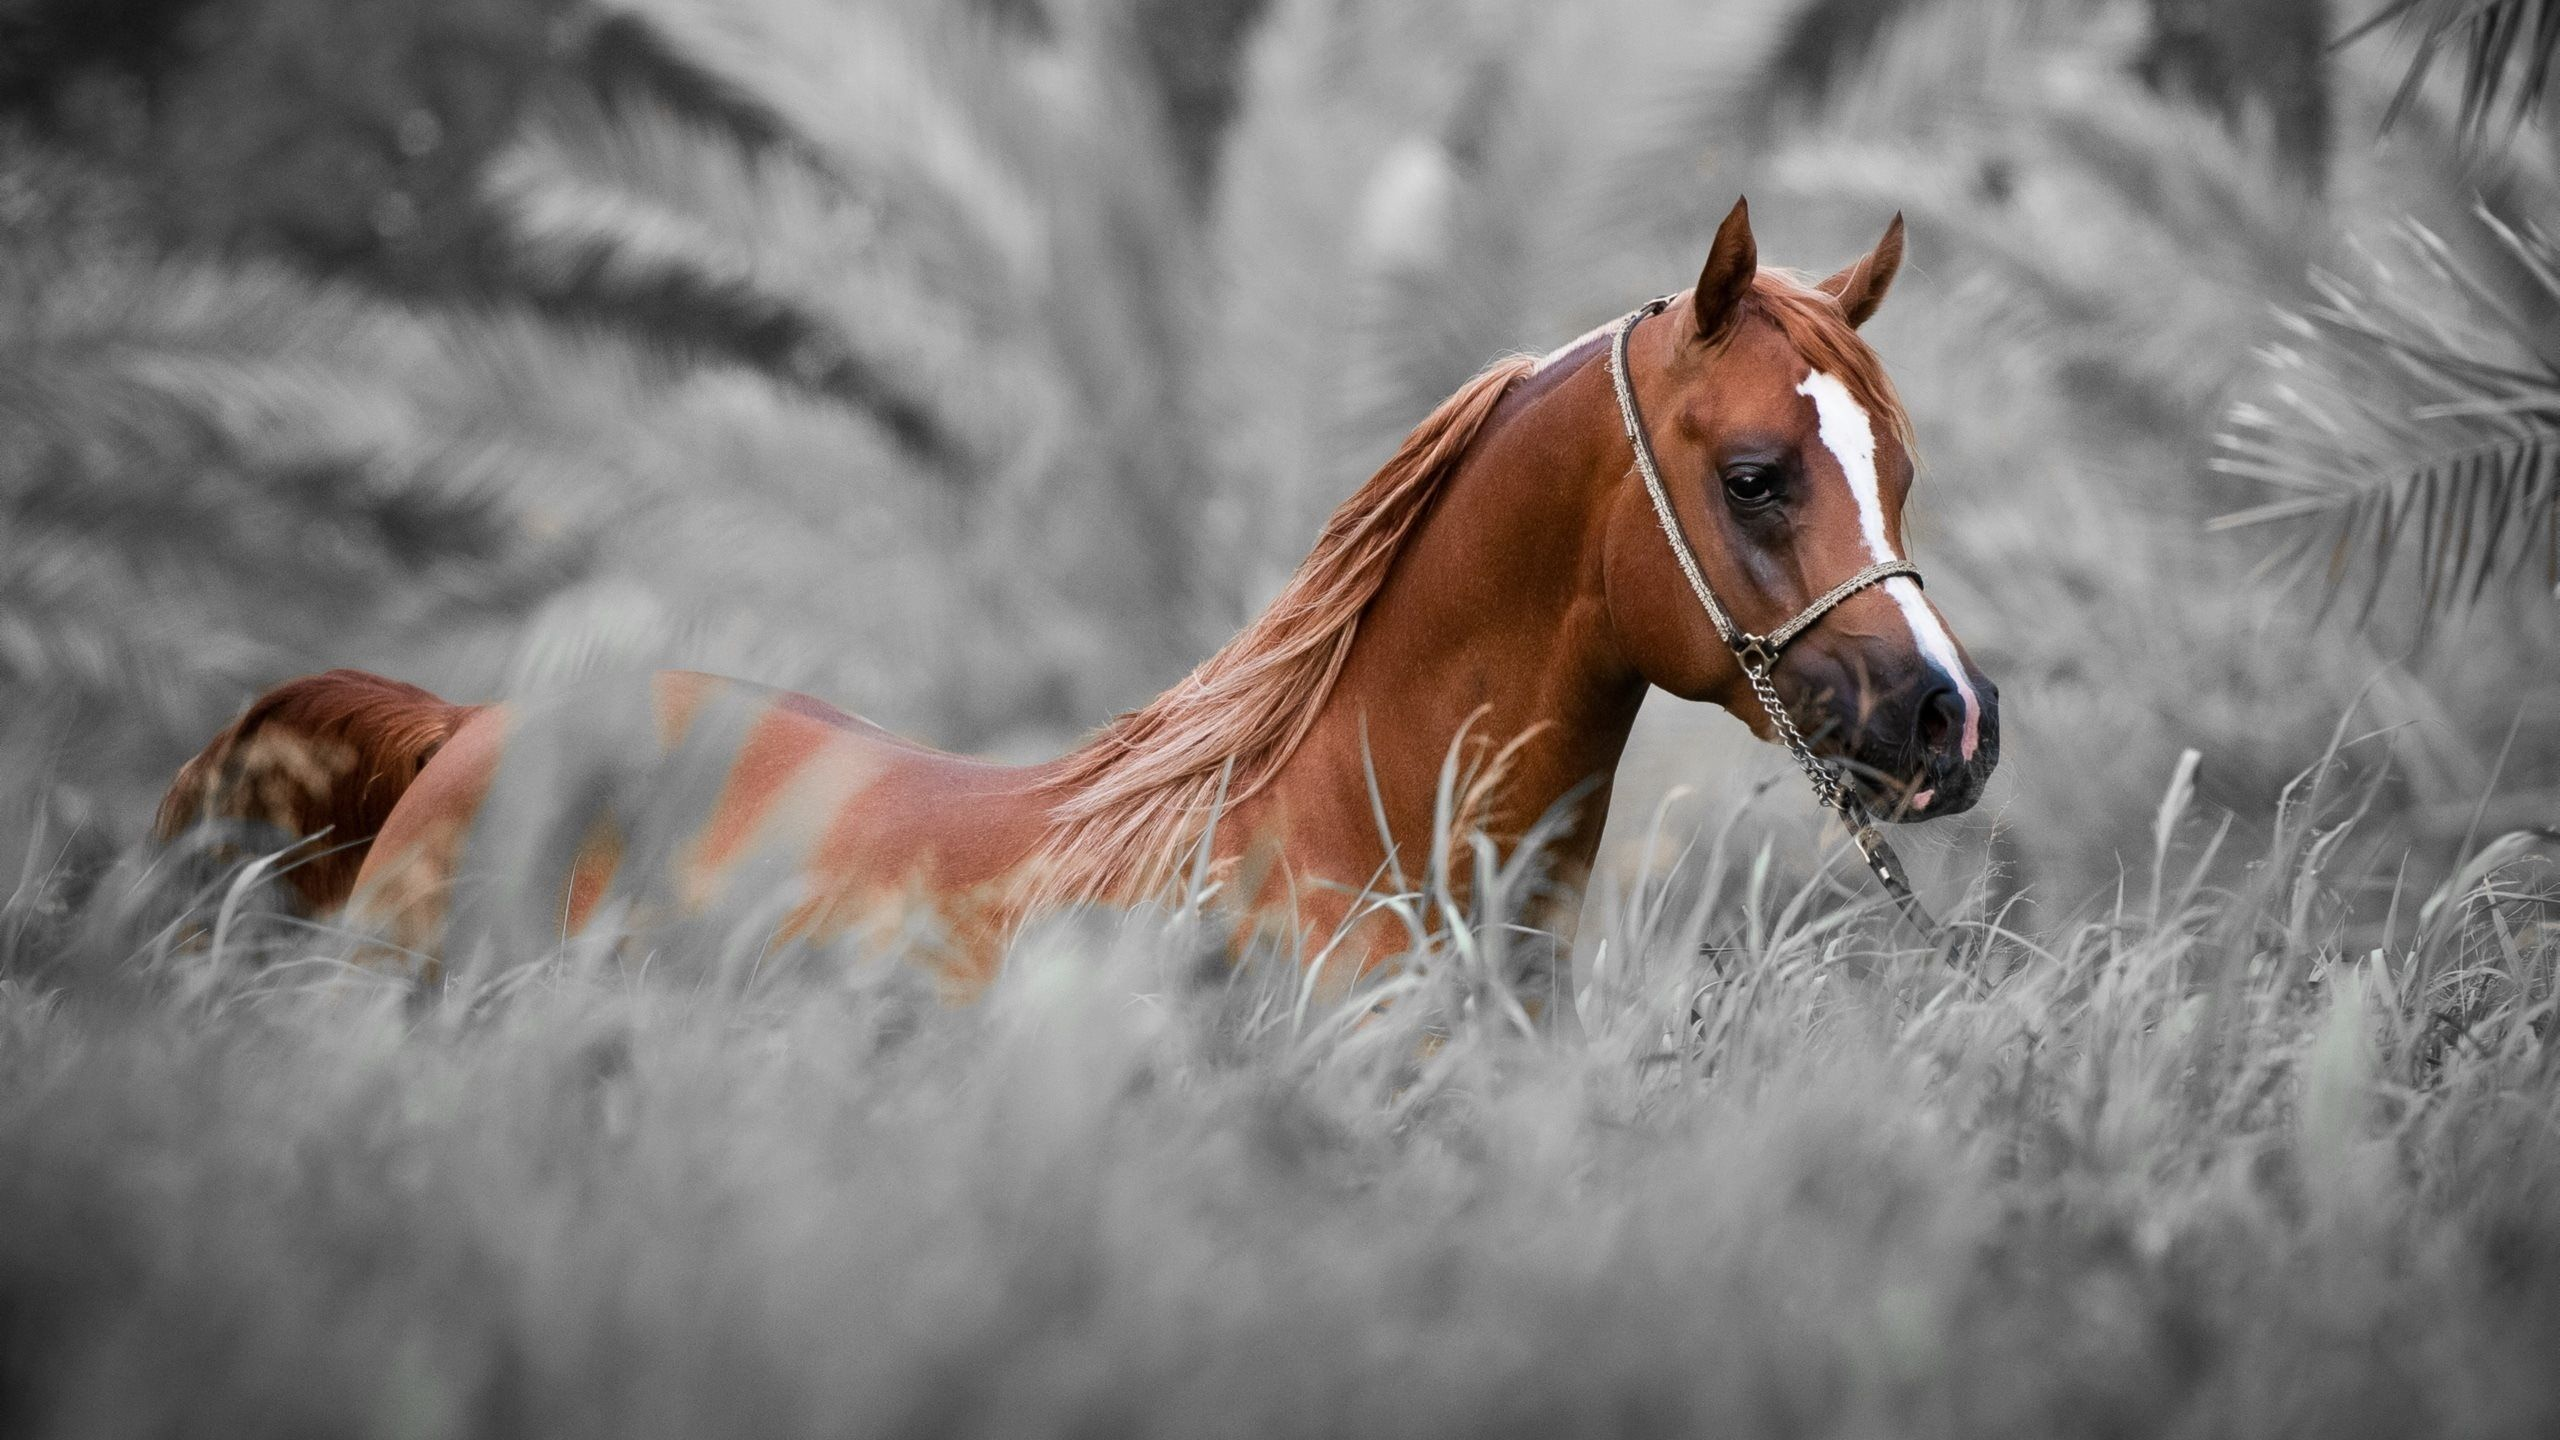 horse wallpaper,horse,mammal,vertebrate,mustang horse,mane